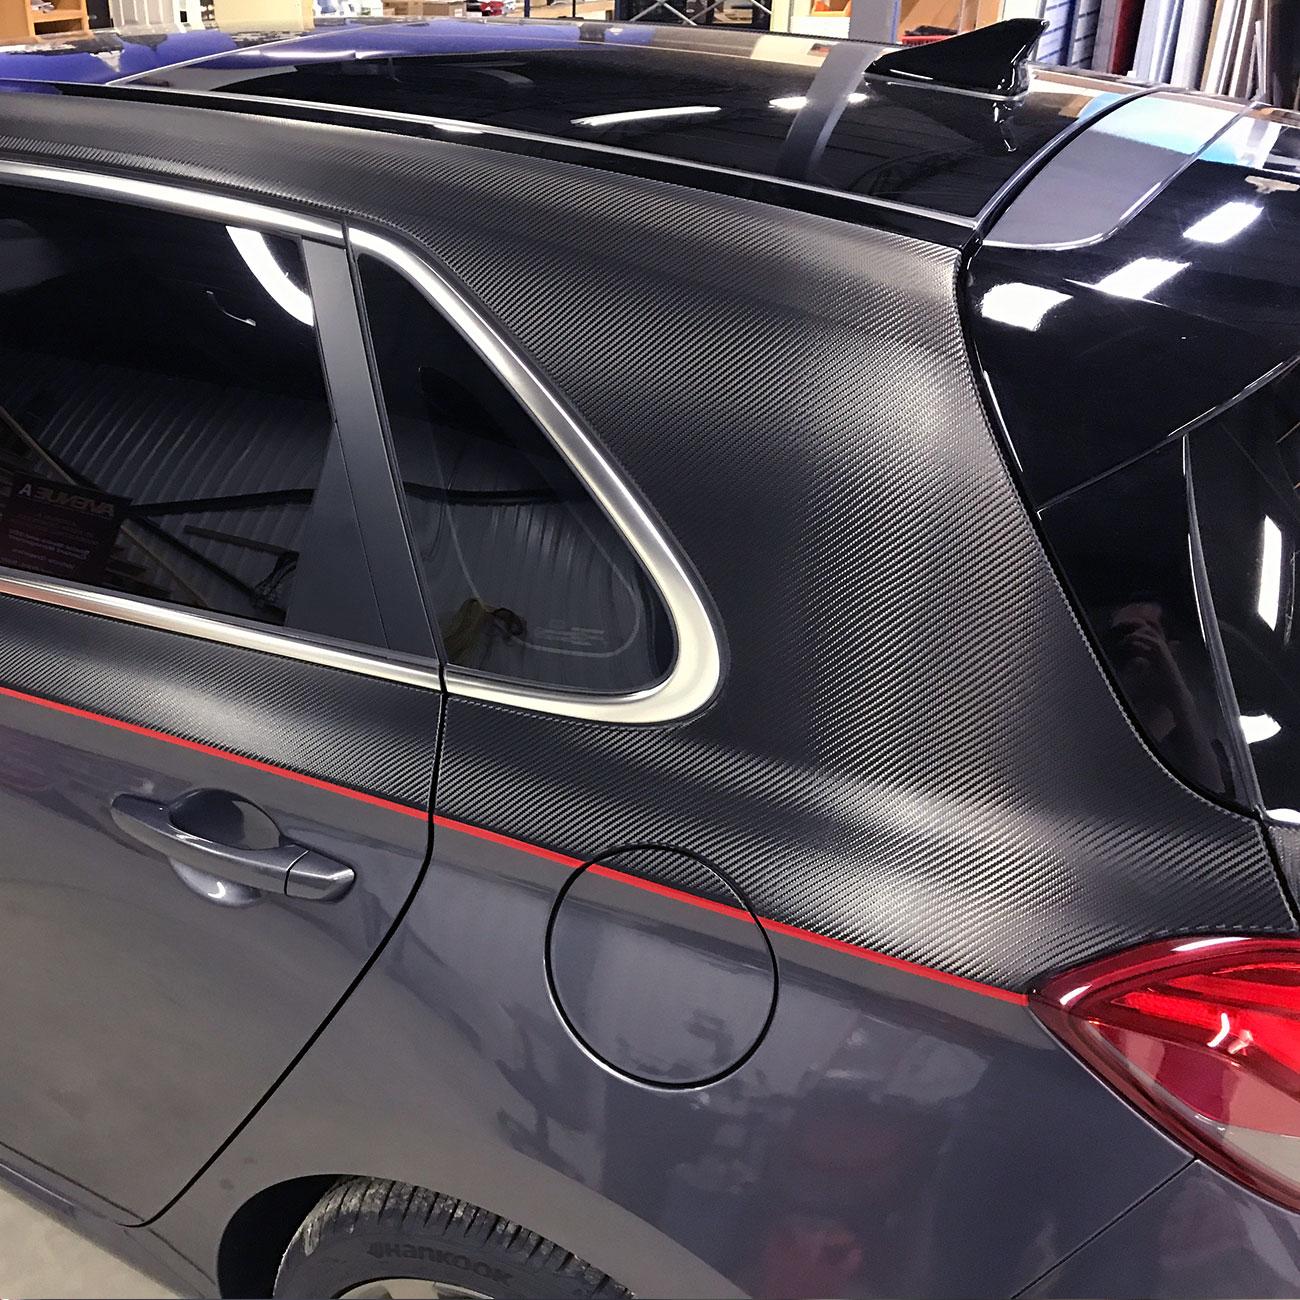 Hyundai Elantra decals